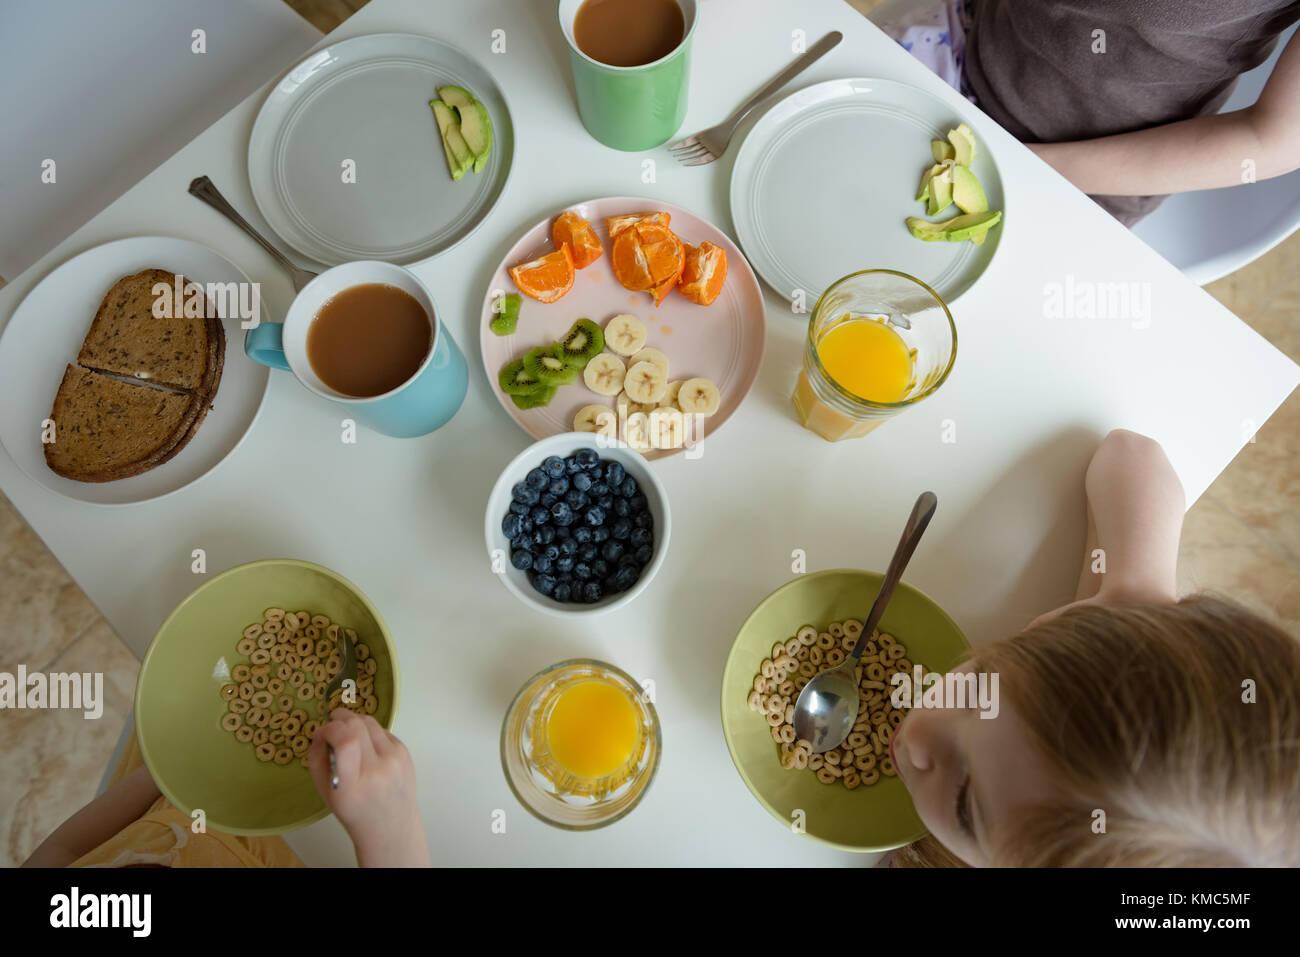 Mother and children having breakfast - Stock Image